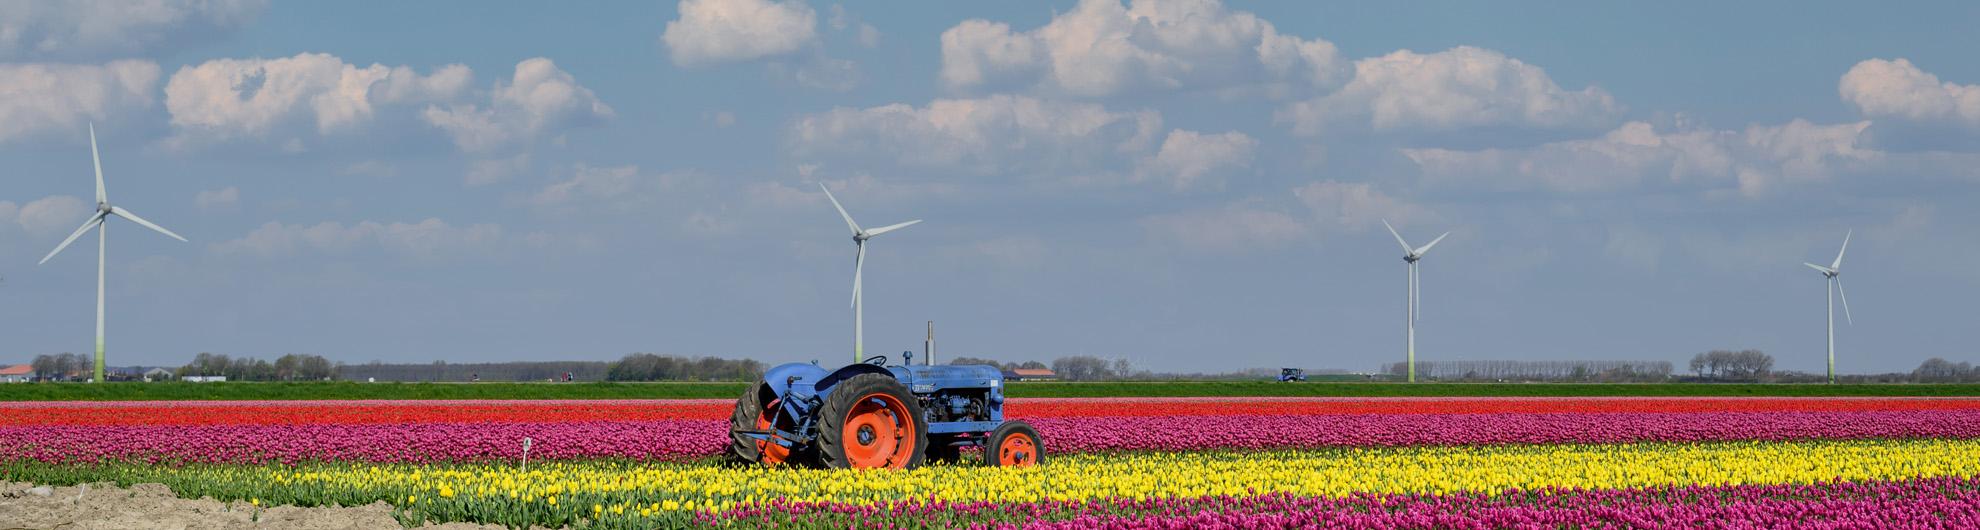 Tulpenveld Flevoland